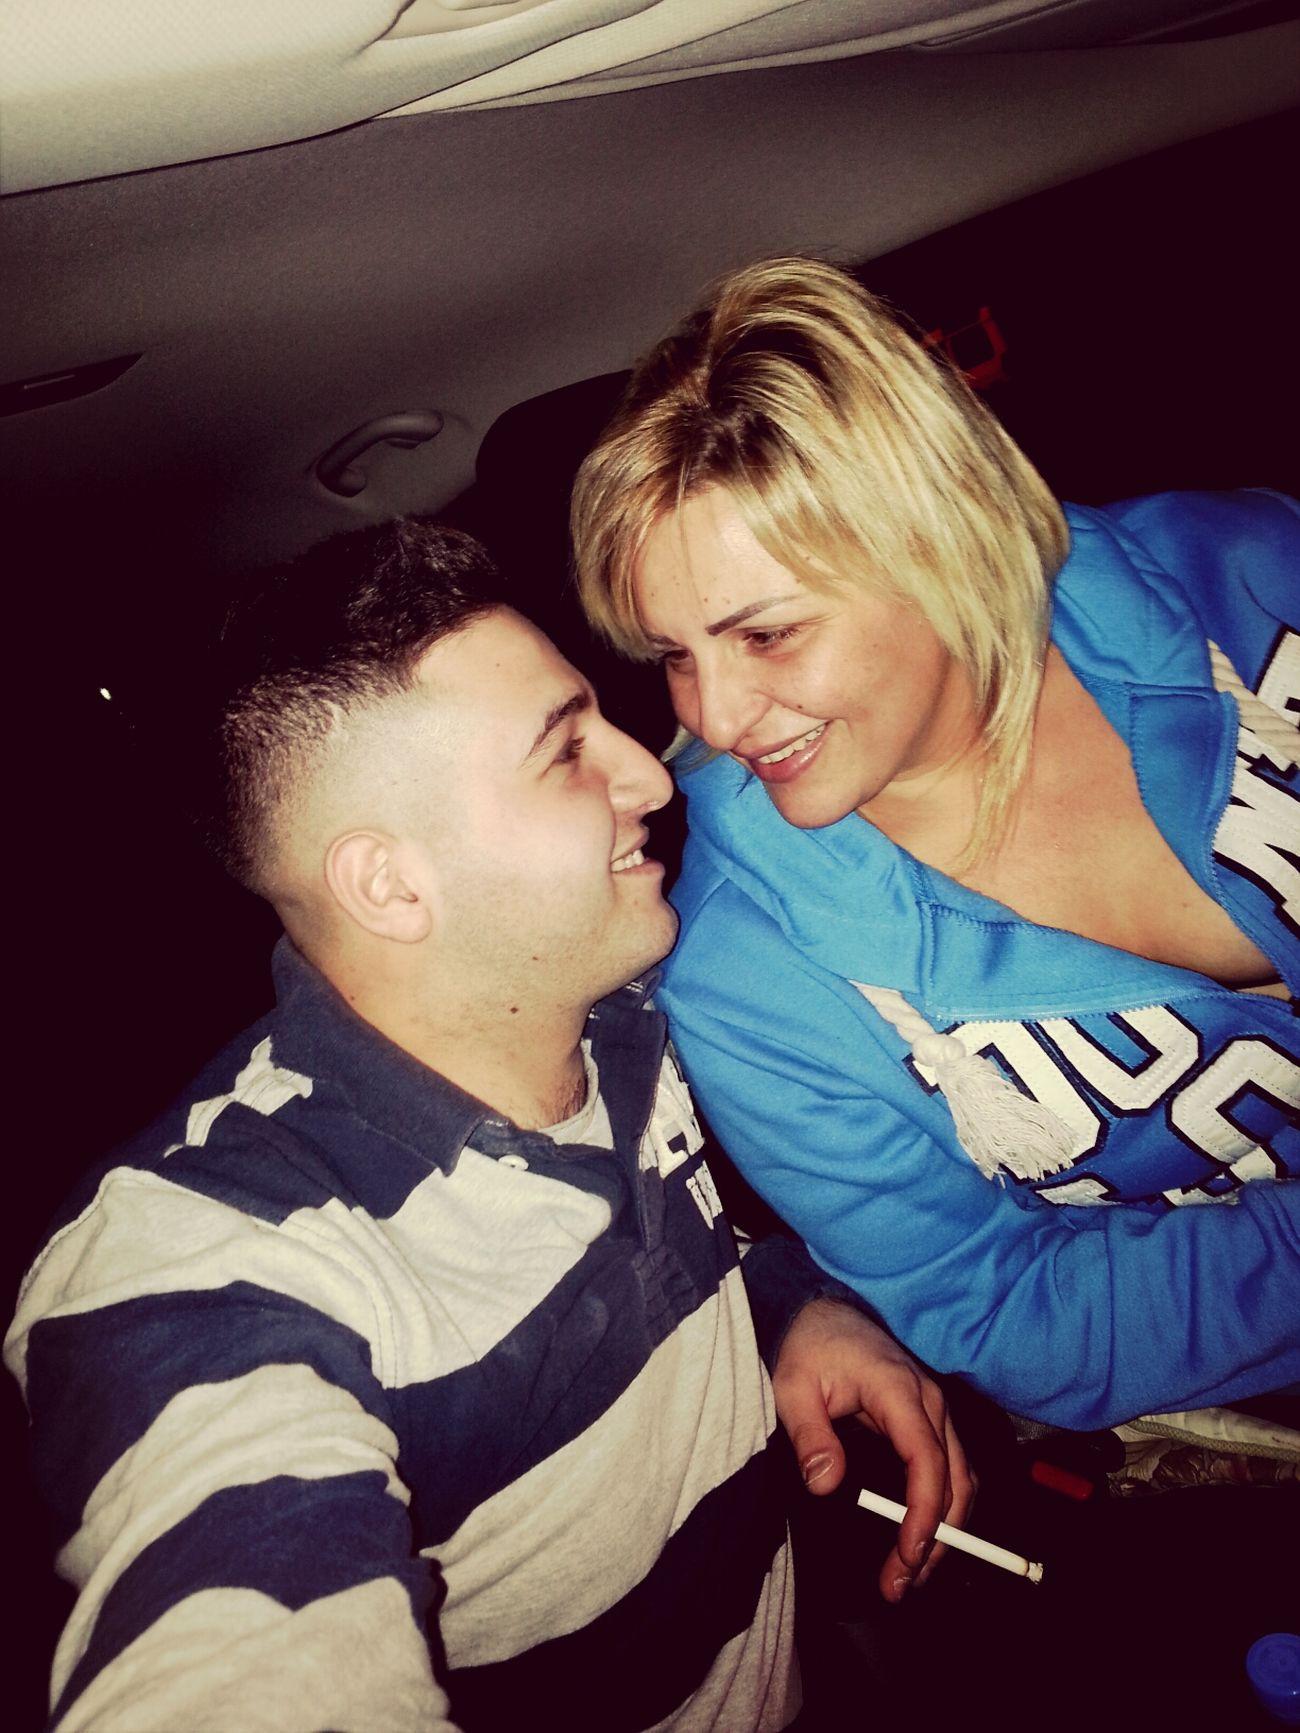 love u :*